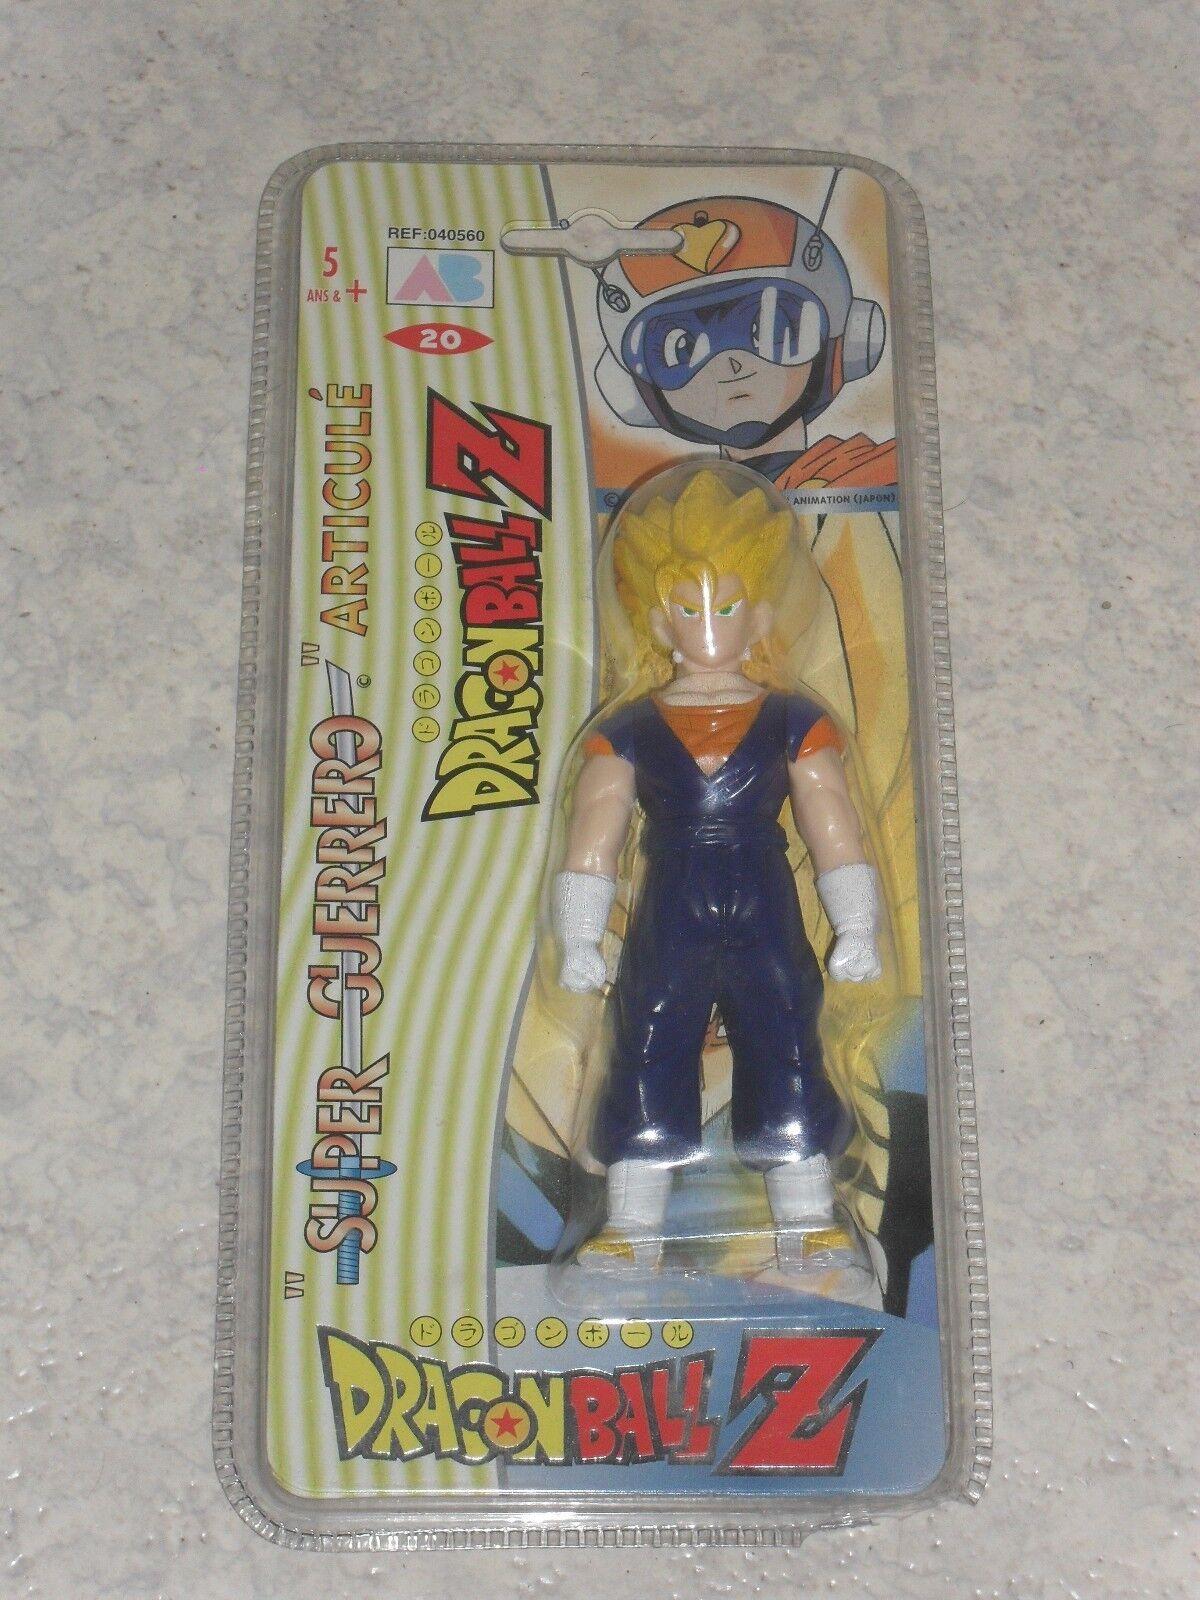 Figurine articulée AB TOYS 20 Dragon Ball Z : Bejito DBZ Dragonball Vegeto